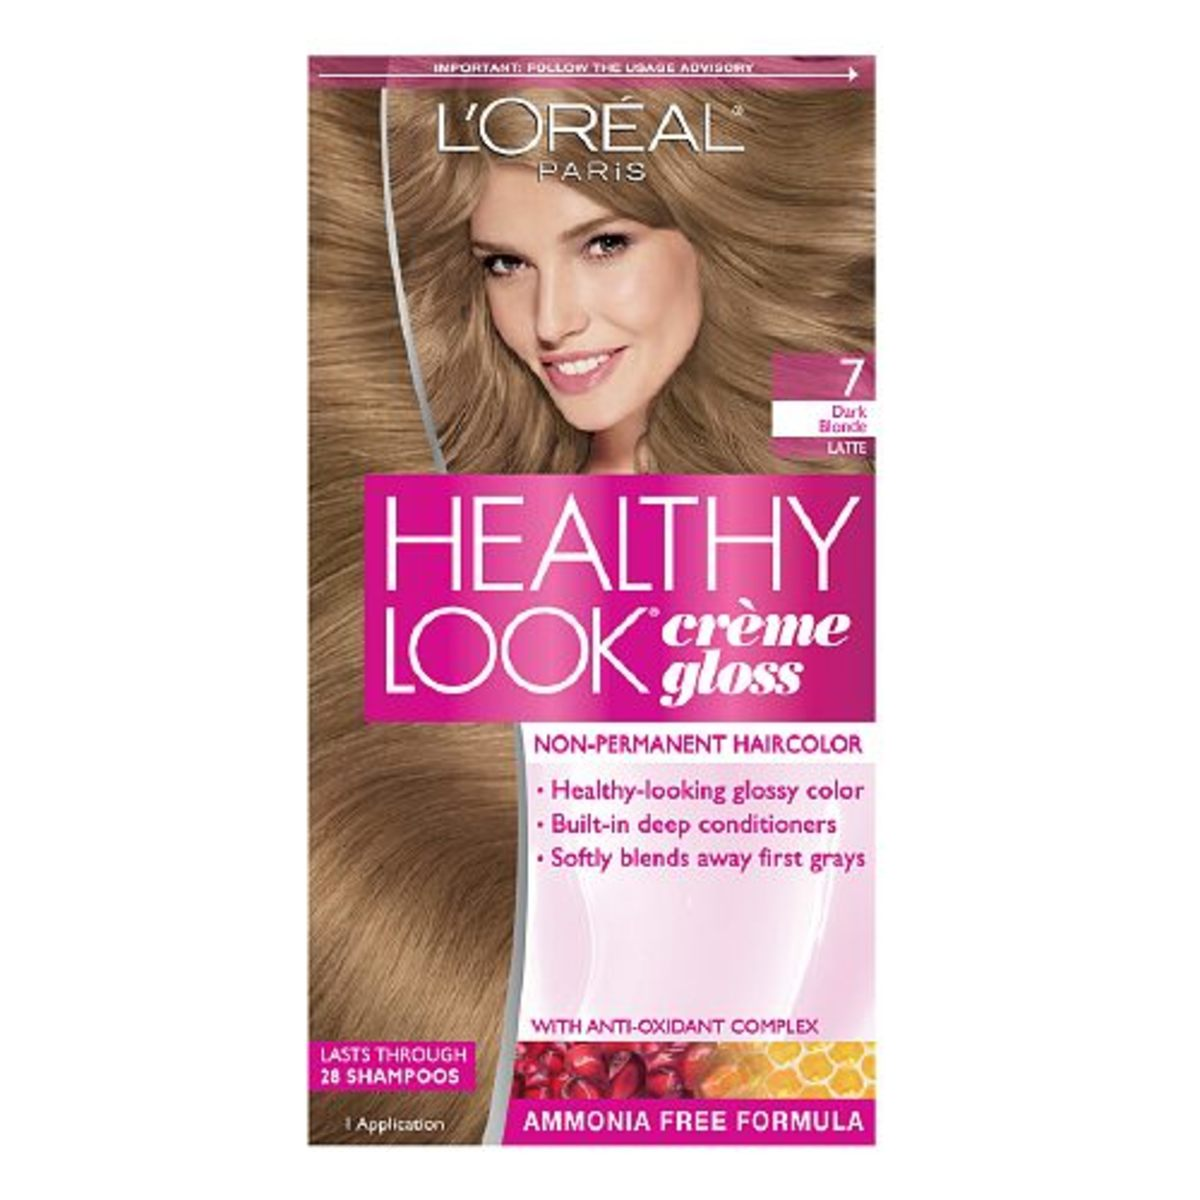 L'Oreal Healthy Look Creme Gloss in 7 Dark Blonde Latte